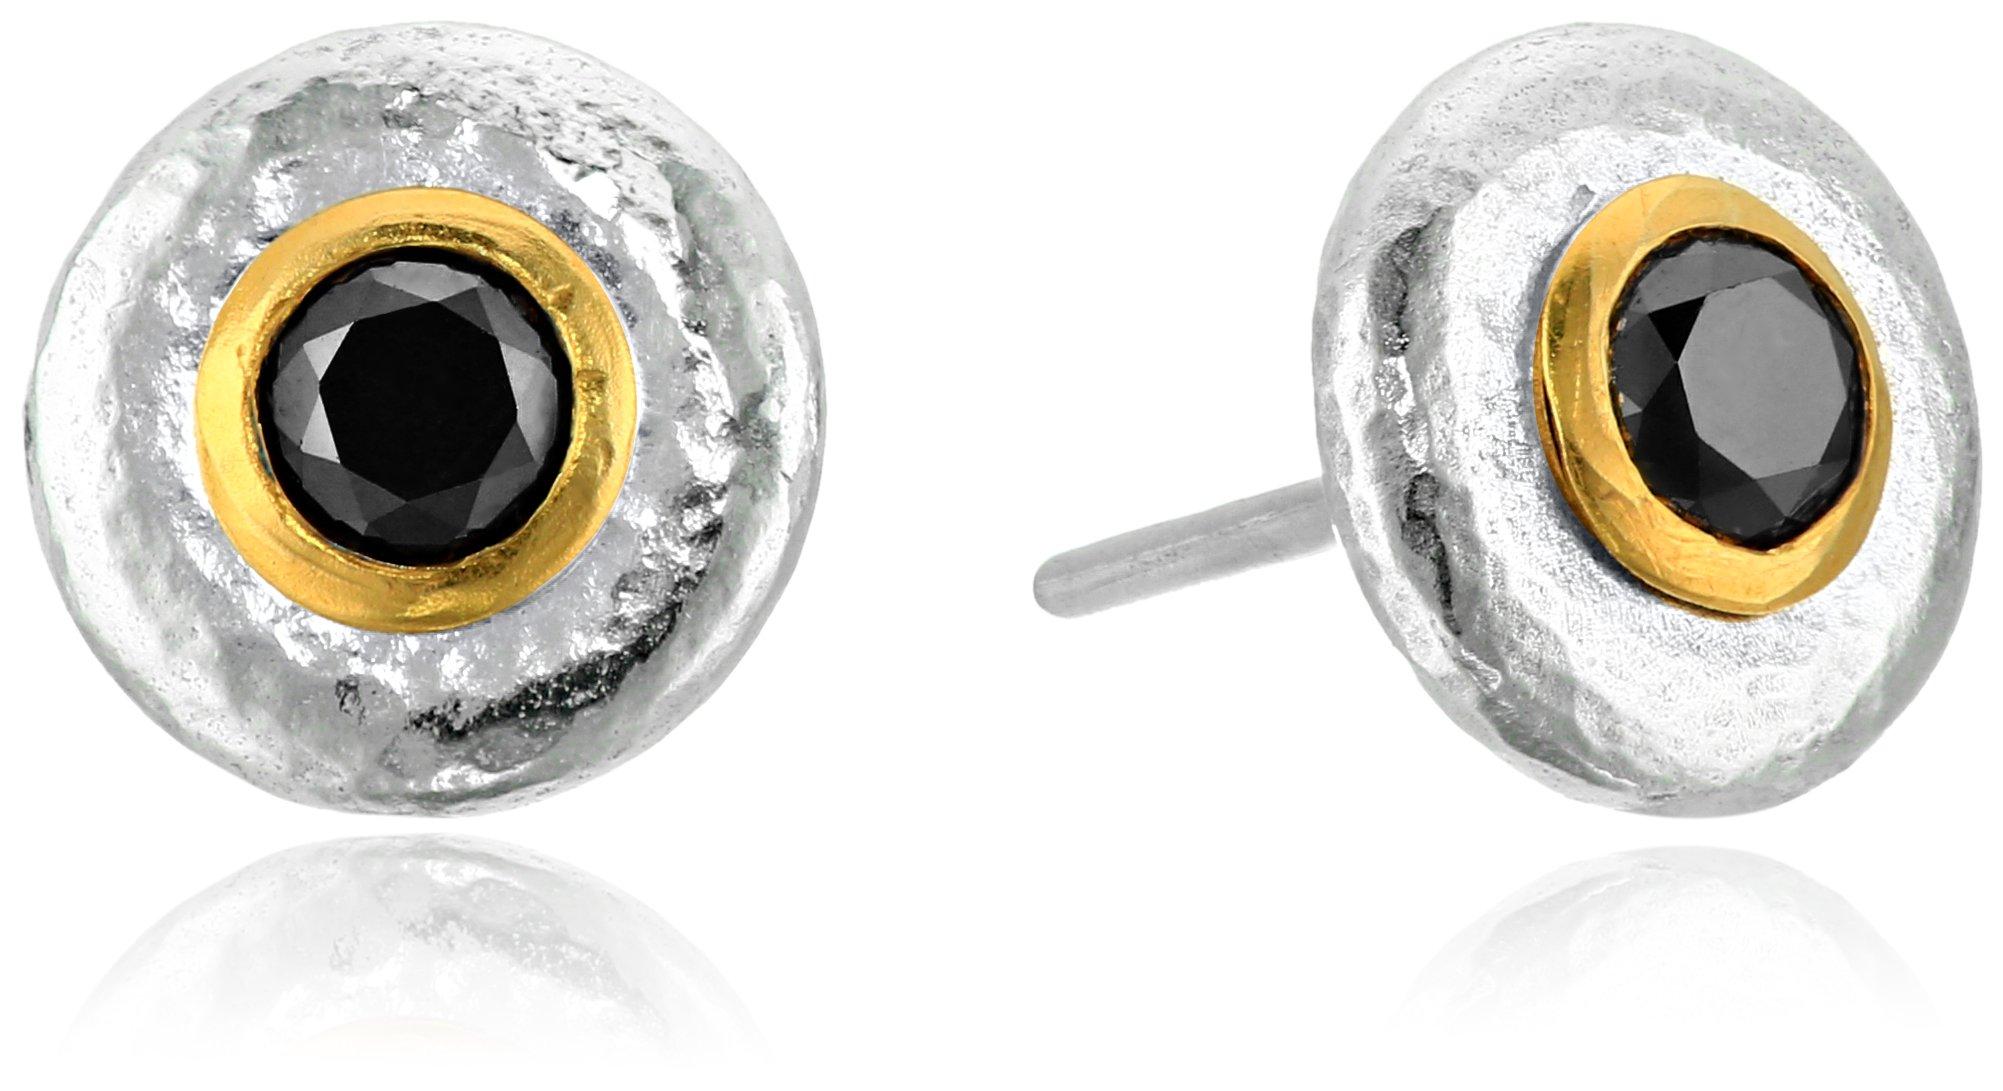 GURHAN ''Droplet'' Sterling Silver Black Diamond Stud Earrings (5/8cttw)